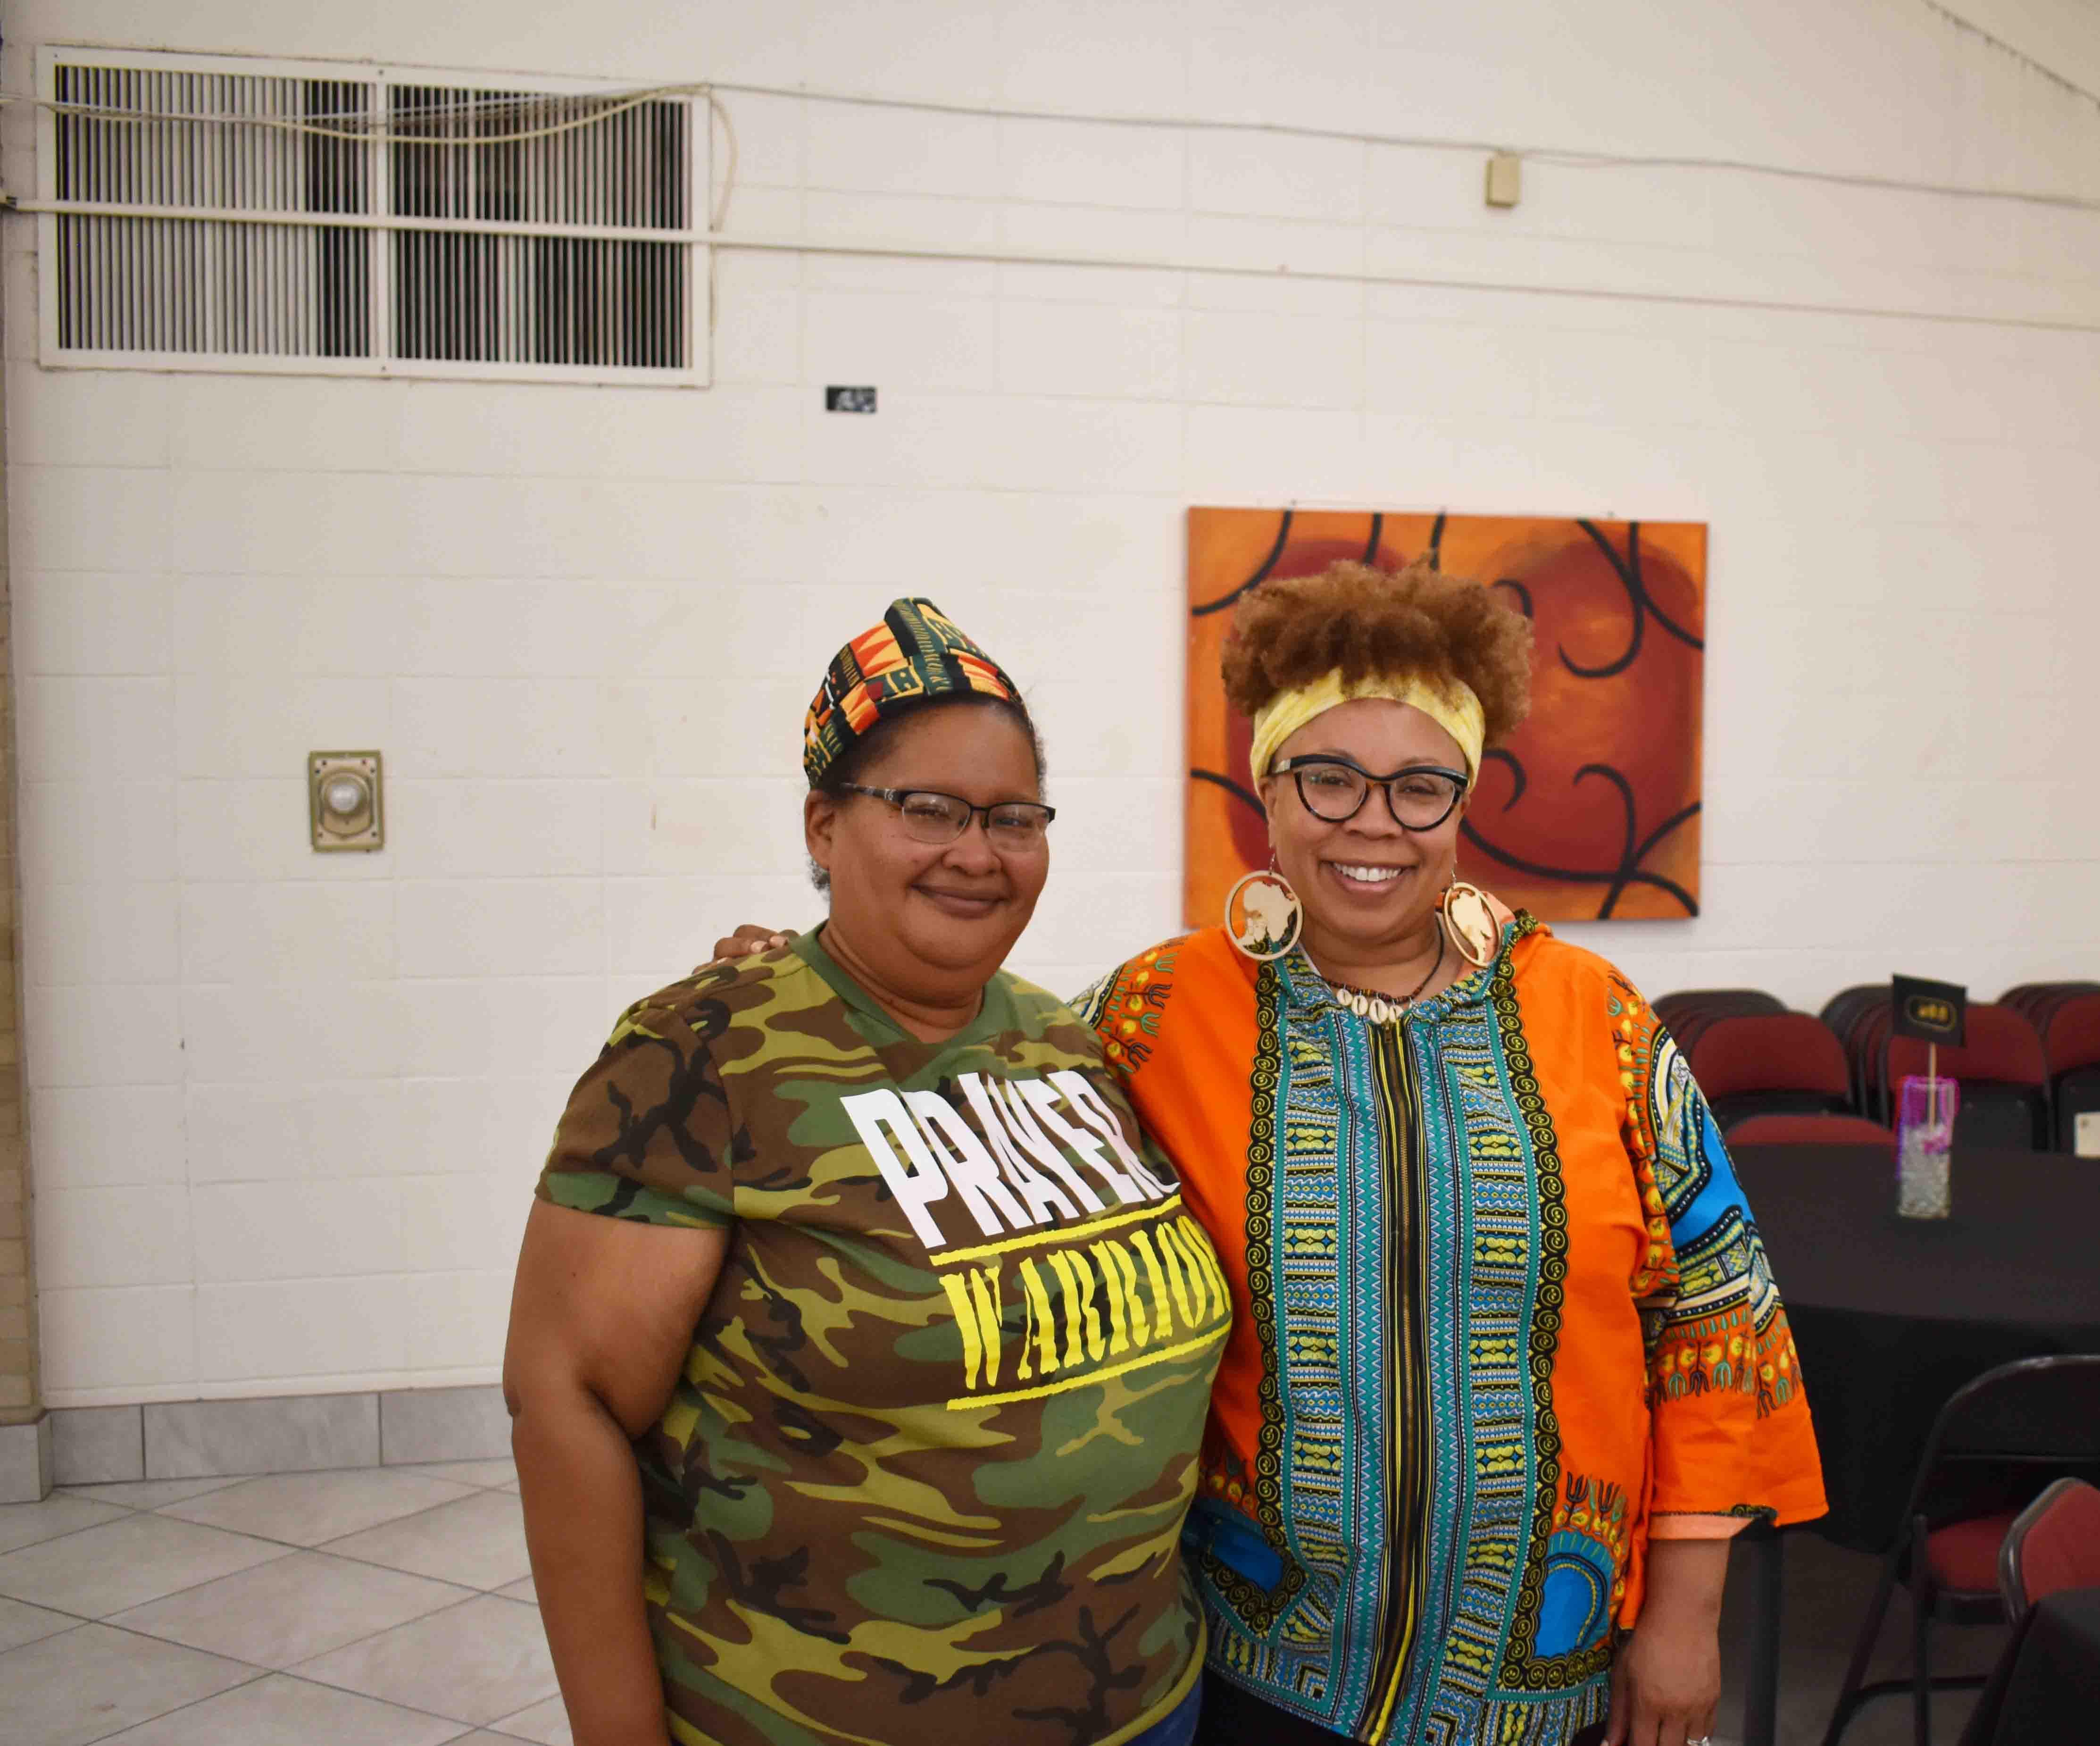 Evelyn James, Kenya Eddings